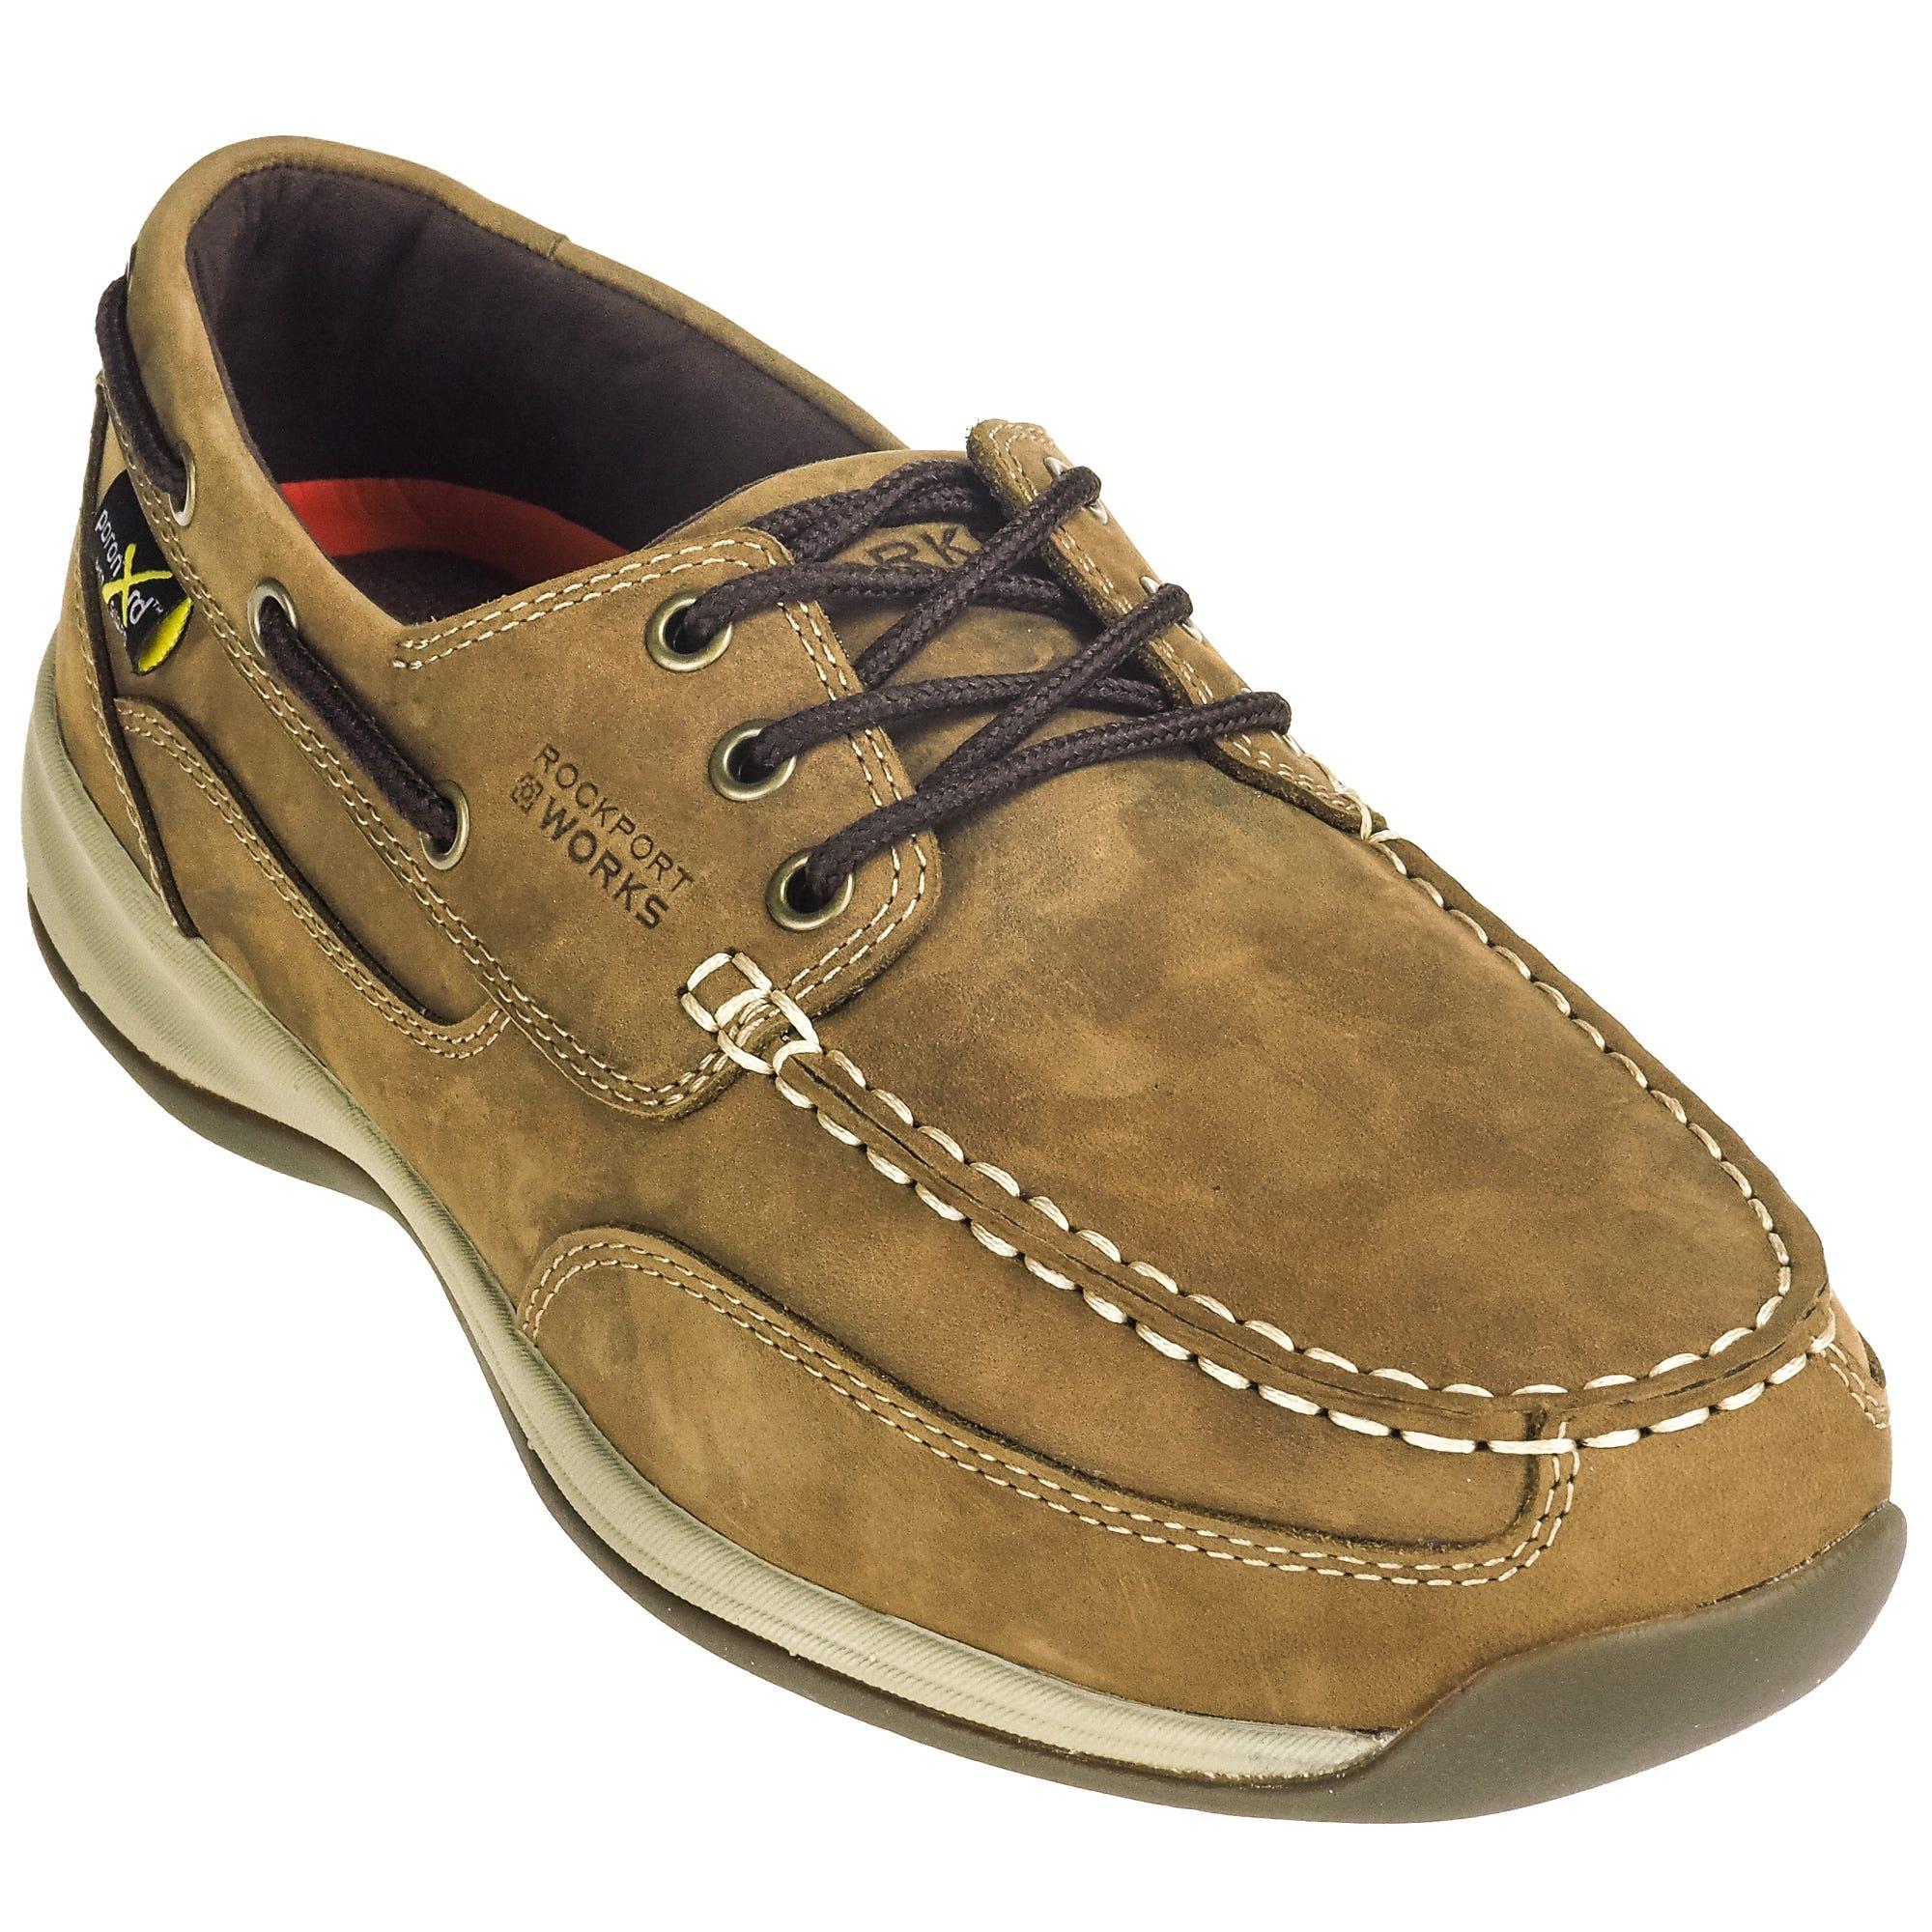 Rockport Works RK6734 Men's Internal Met Guard Steel Toe Boat Shoes